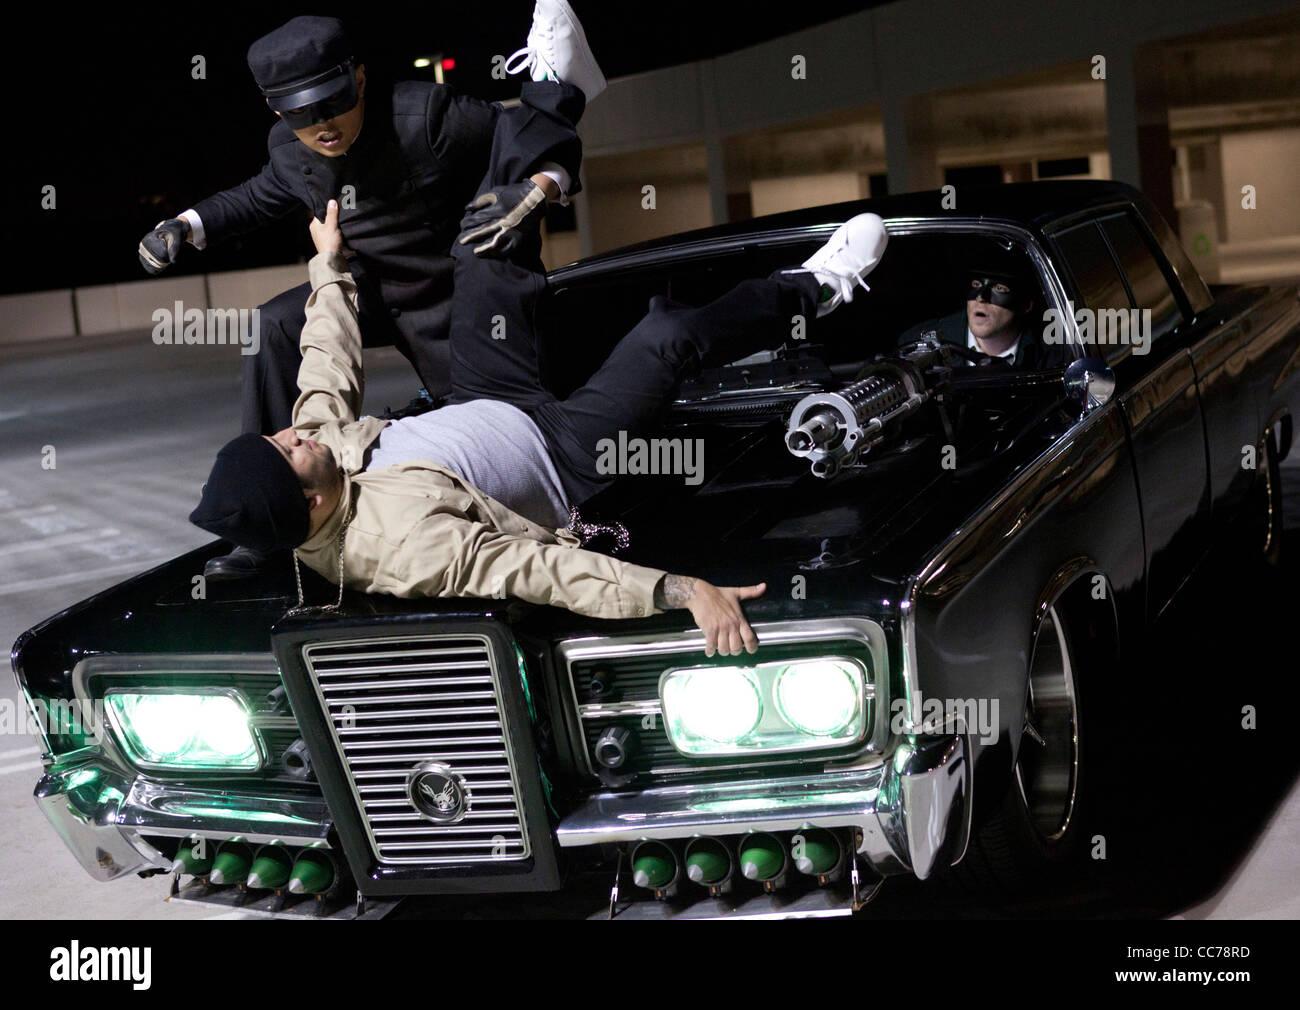 Jay Chou Seth Rogen The Green Hornet 2011 Stock Photo Alamy